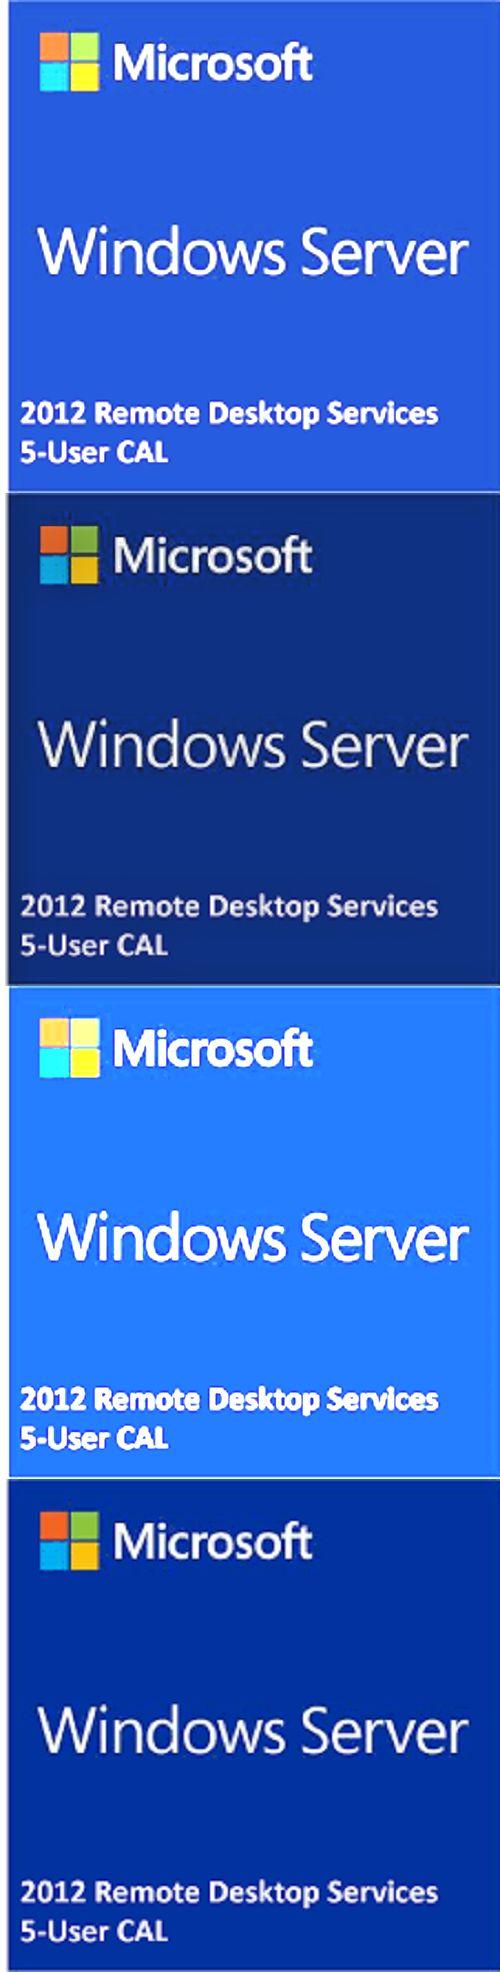 Servers Development and DBMS 80356: Windows Server 2012 R2 Remote